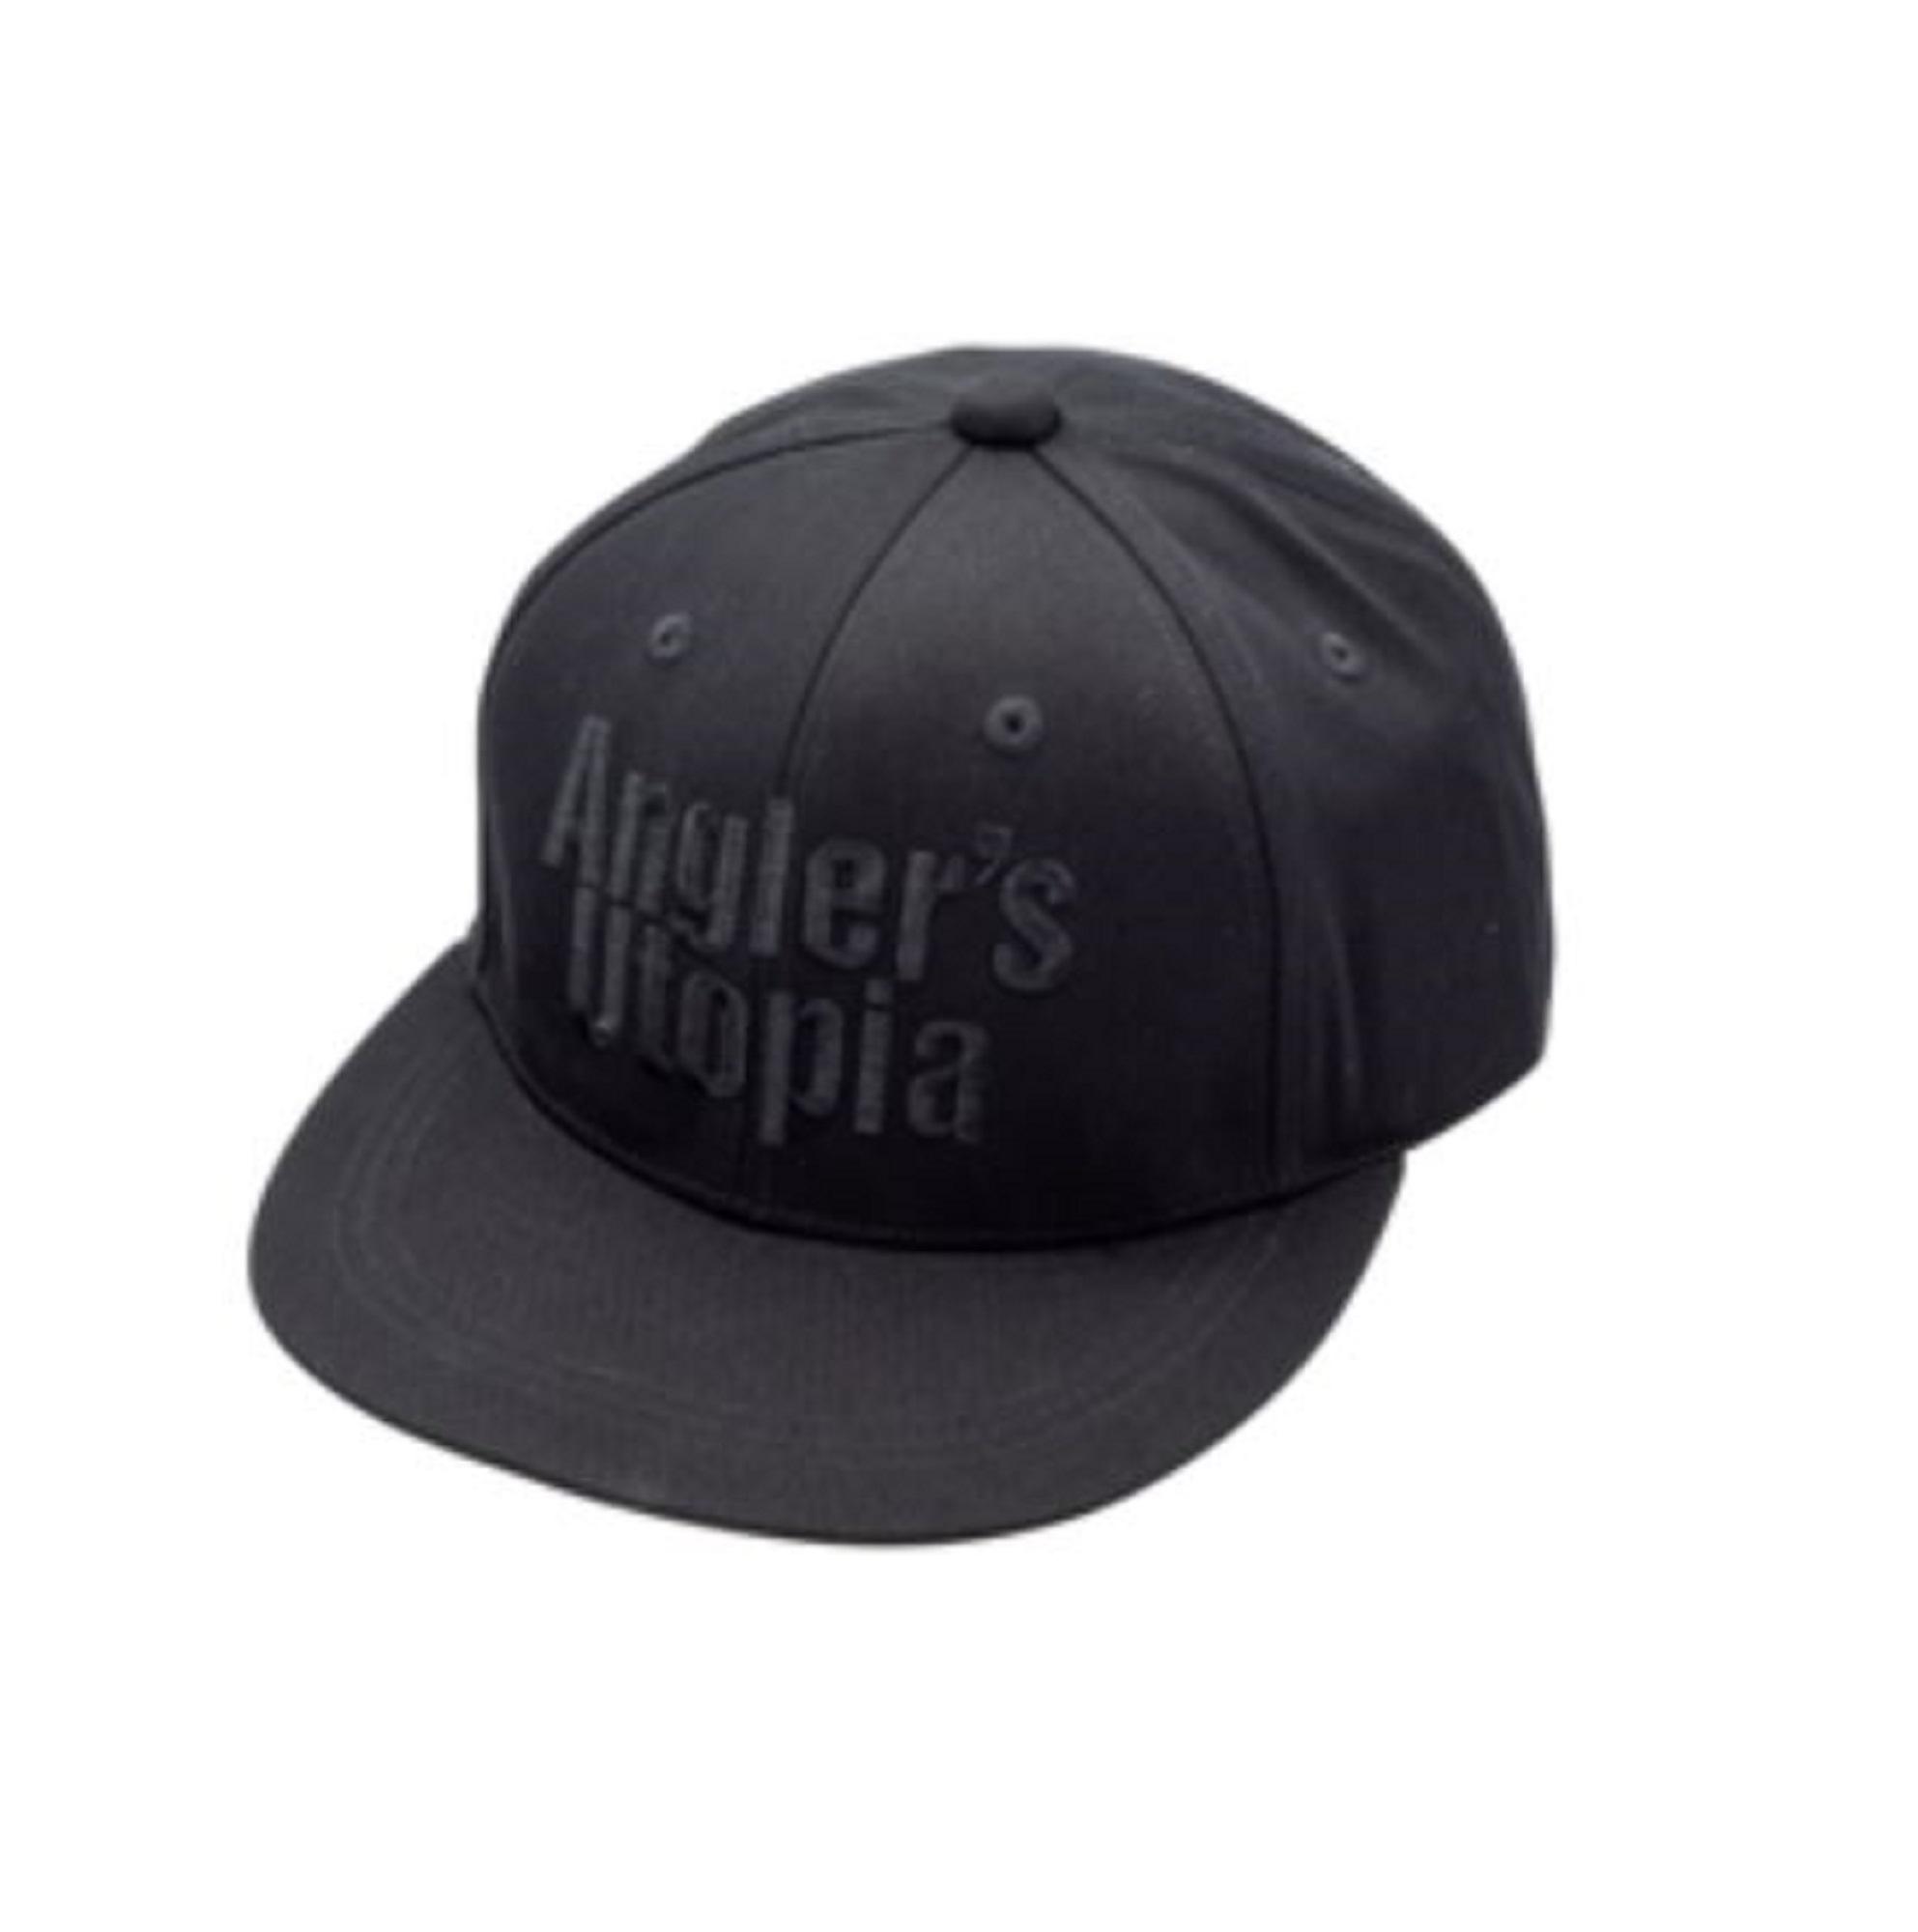 Apia Cap Flat Cap Free Size Black Black (0672)